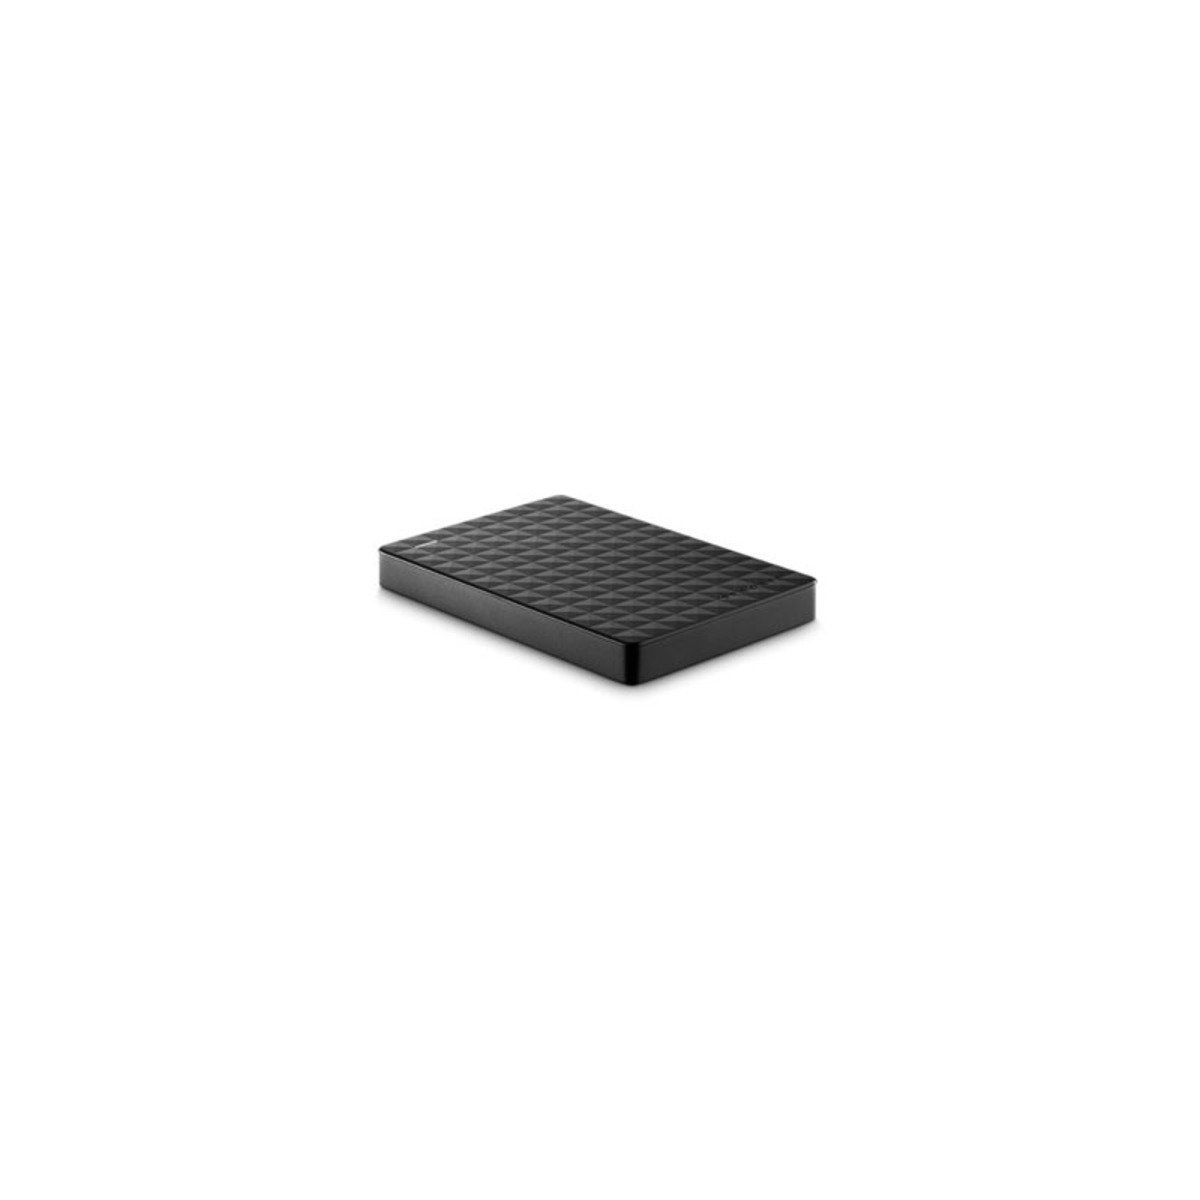 Expansion 1TB USB 3.0 2.5吋 外置硬碟 STEA1000400